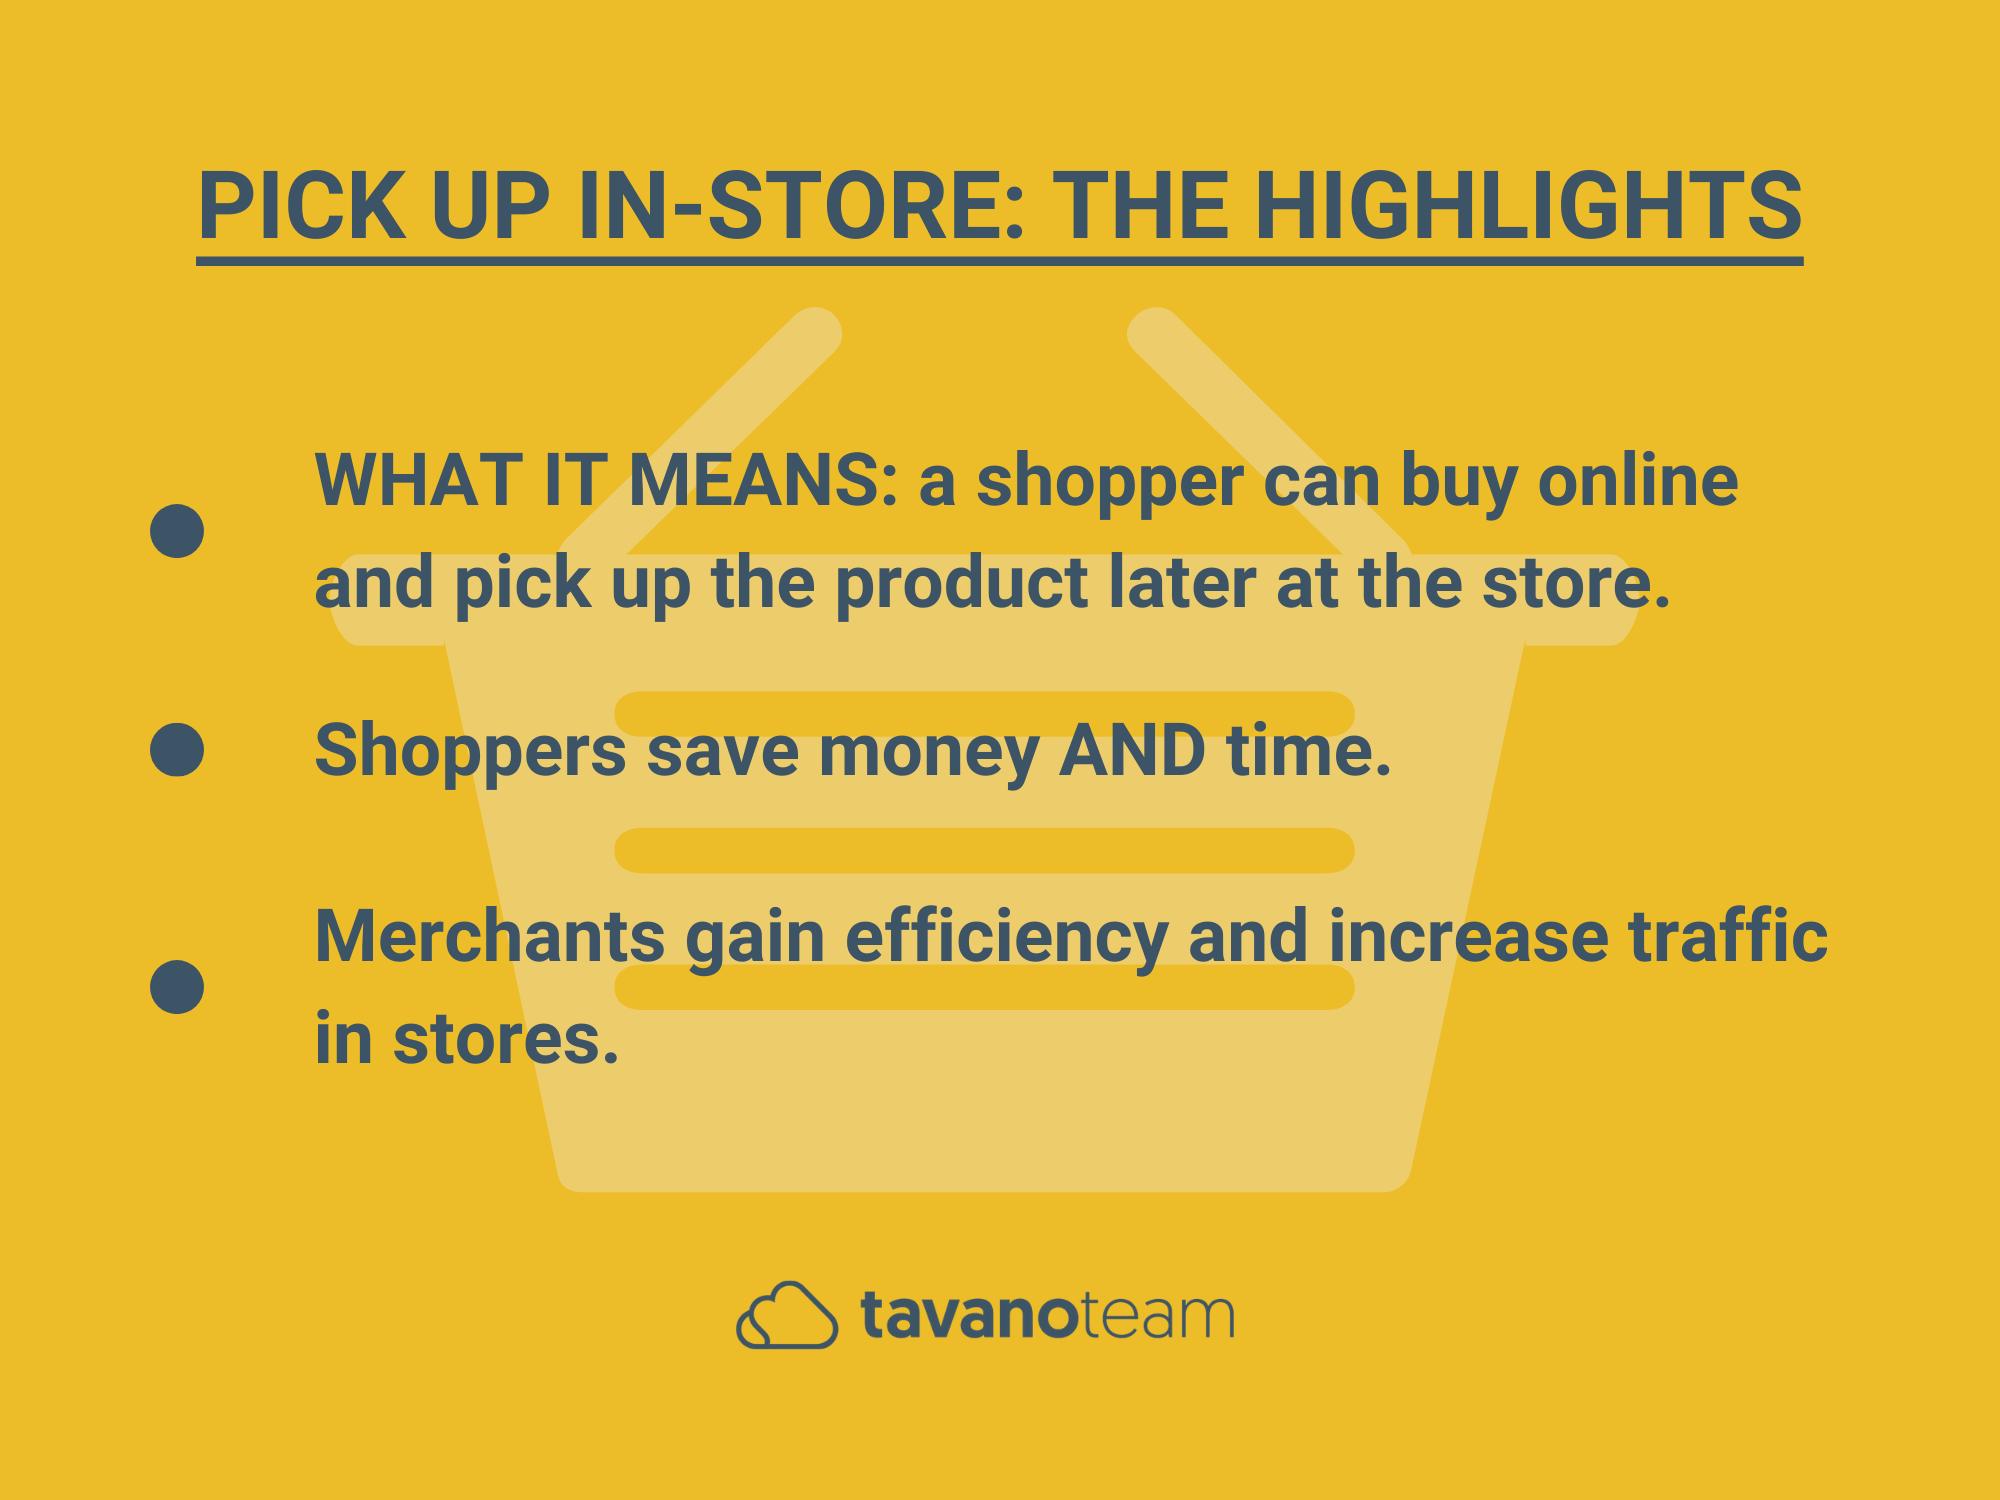 pick-up-in-store-highlights-tavano-team